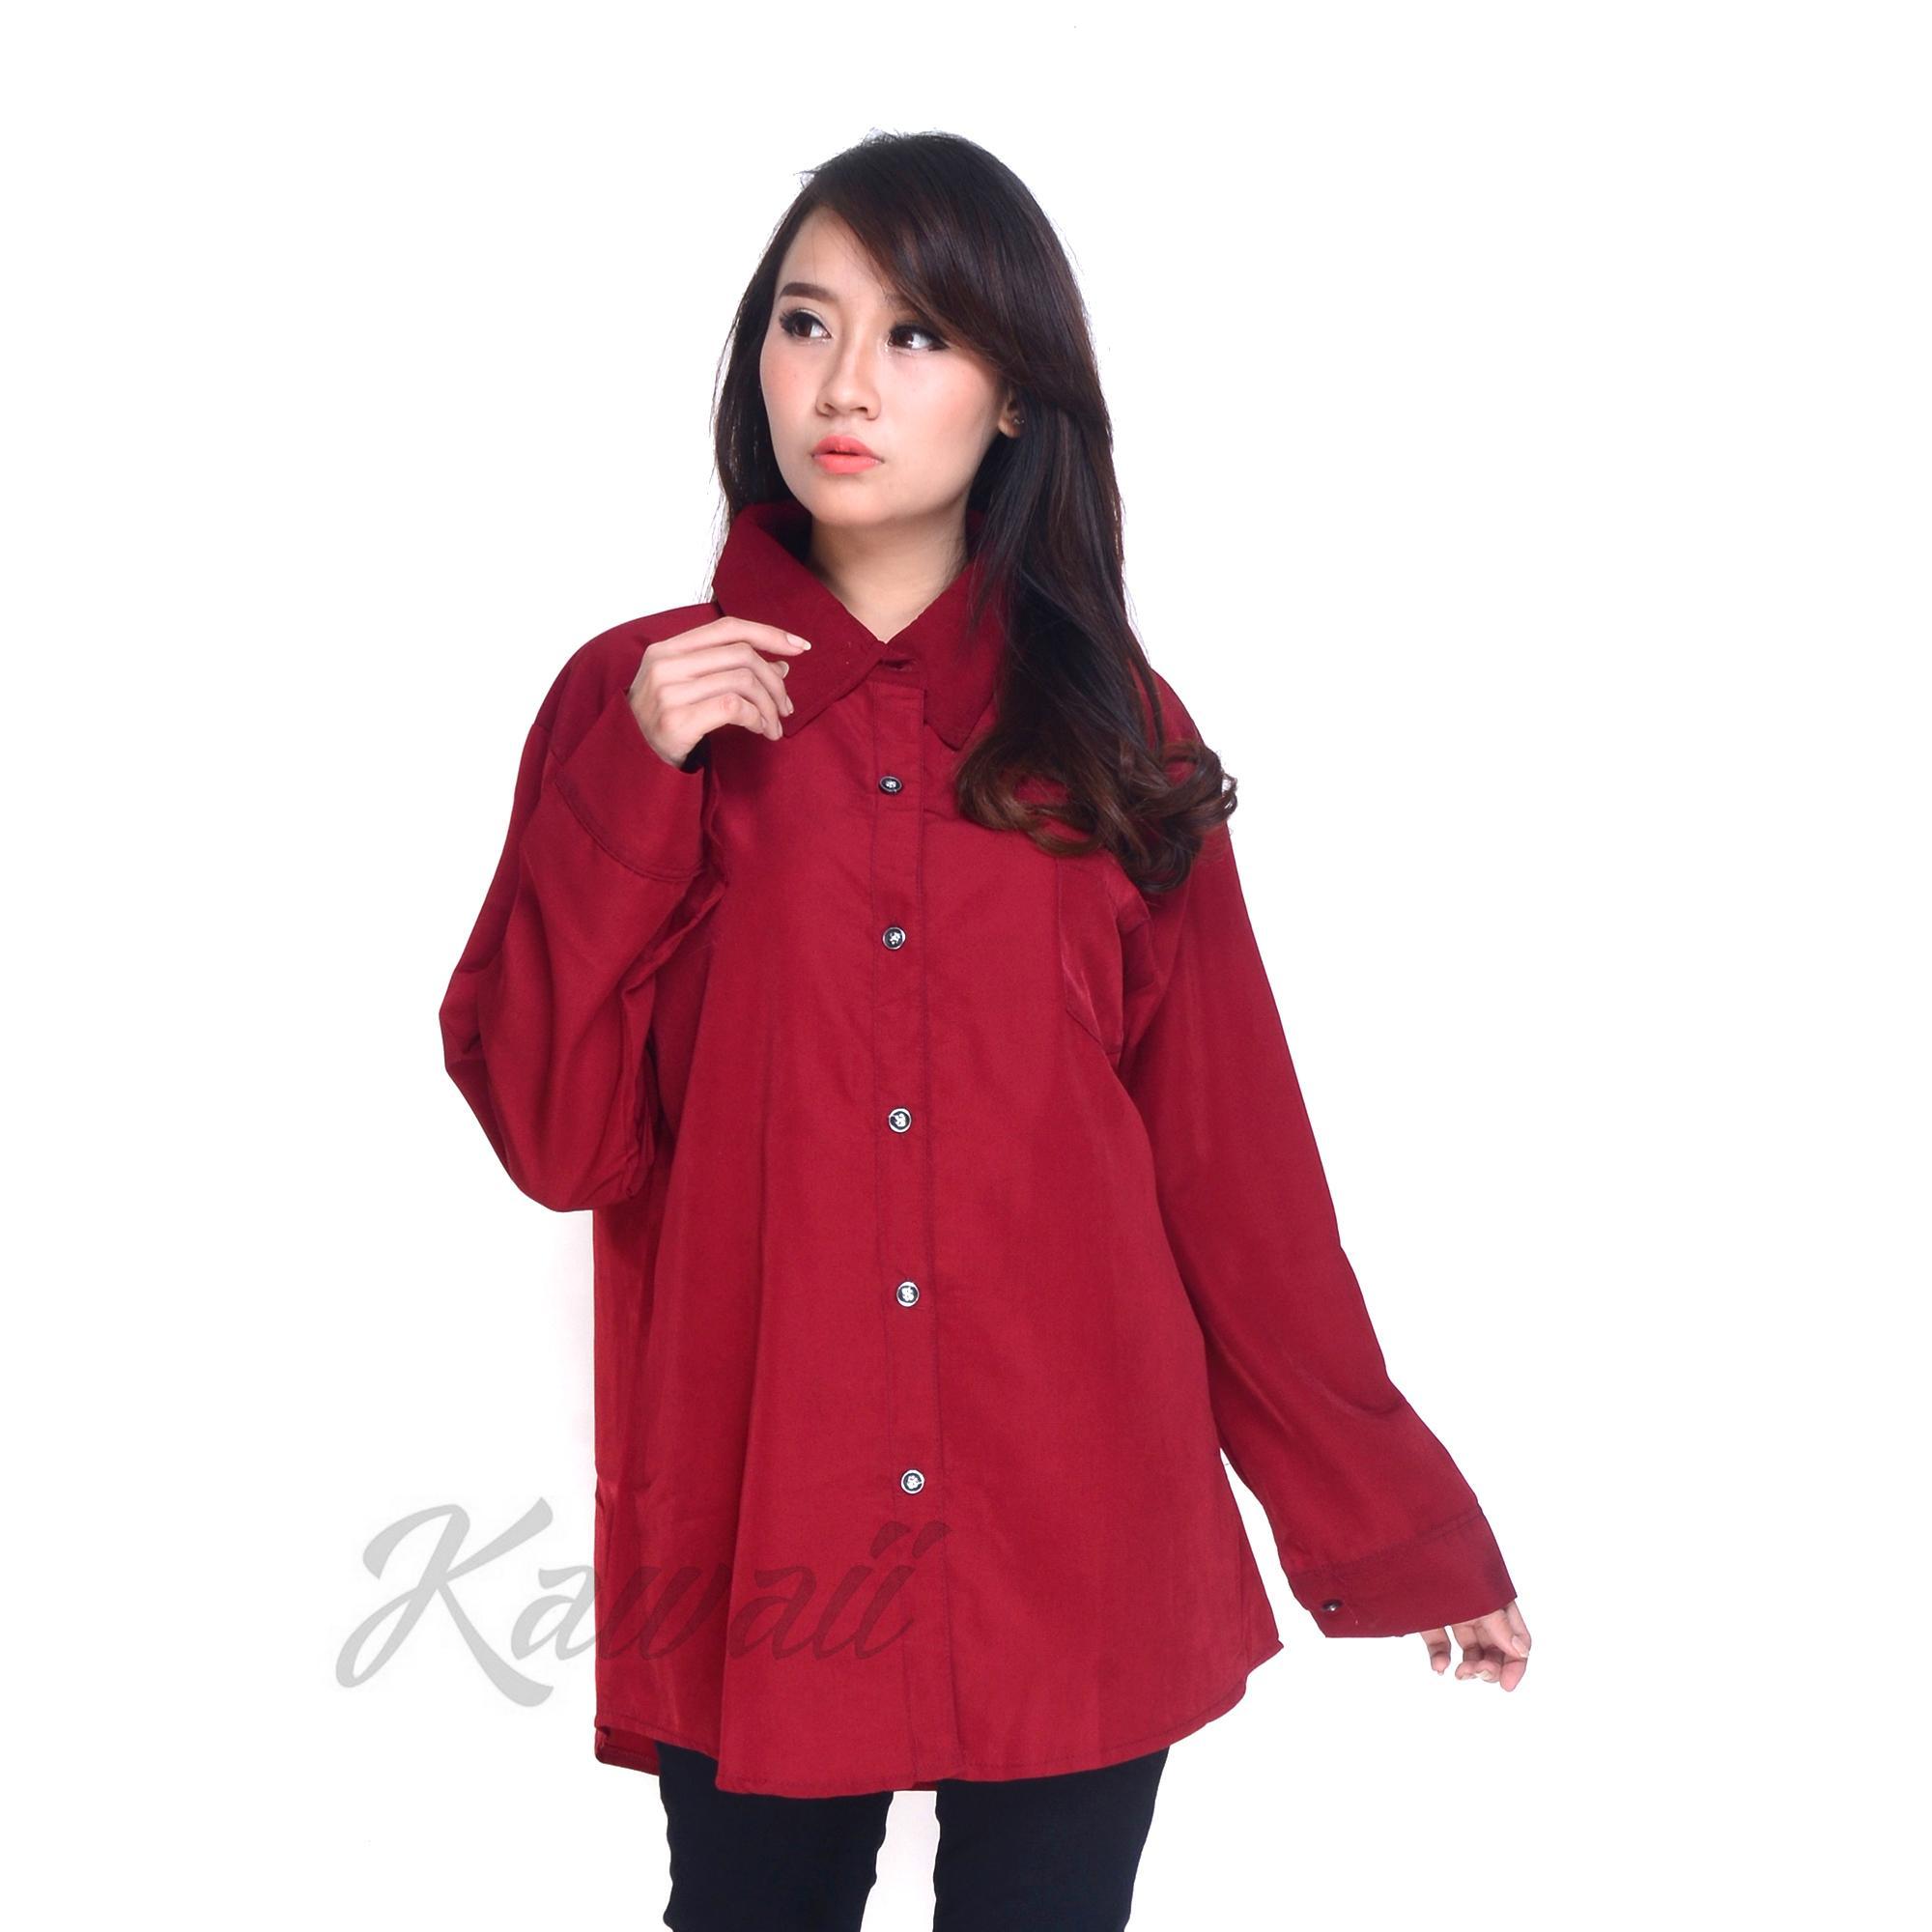 Kawaii Fashion Kemeja Tiara XXL Jumbo Polos Baju Atasan Wanita Murah